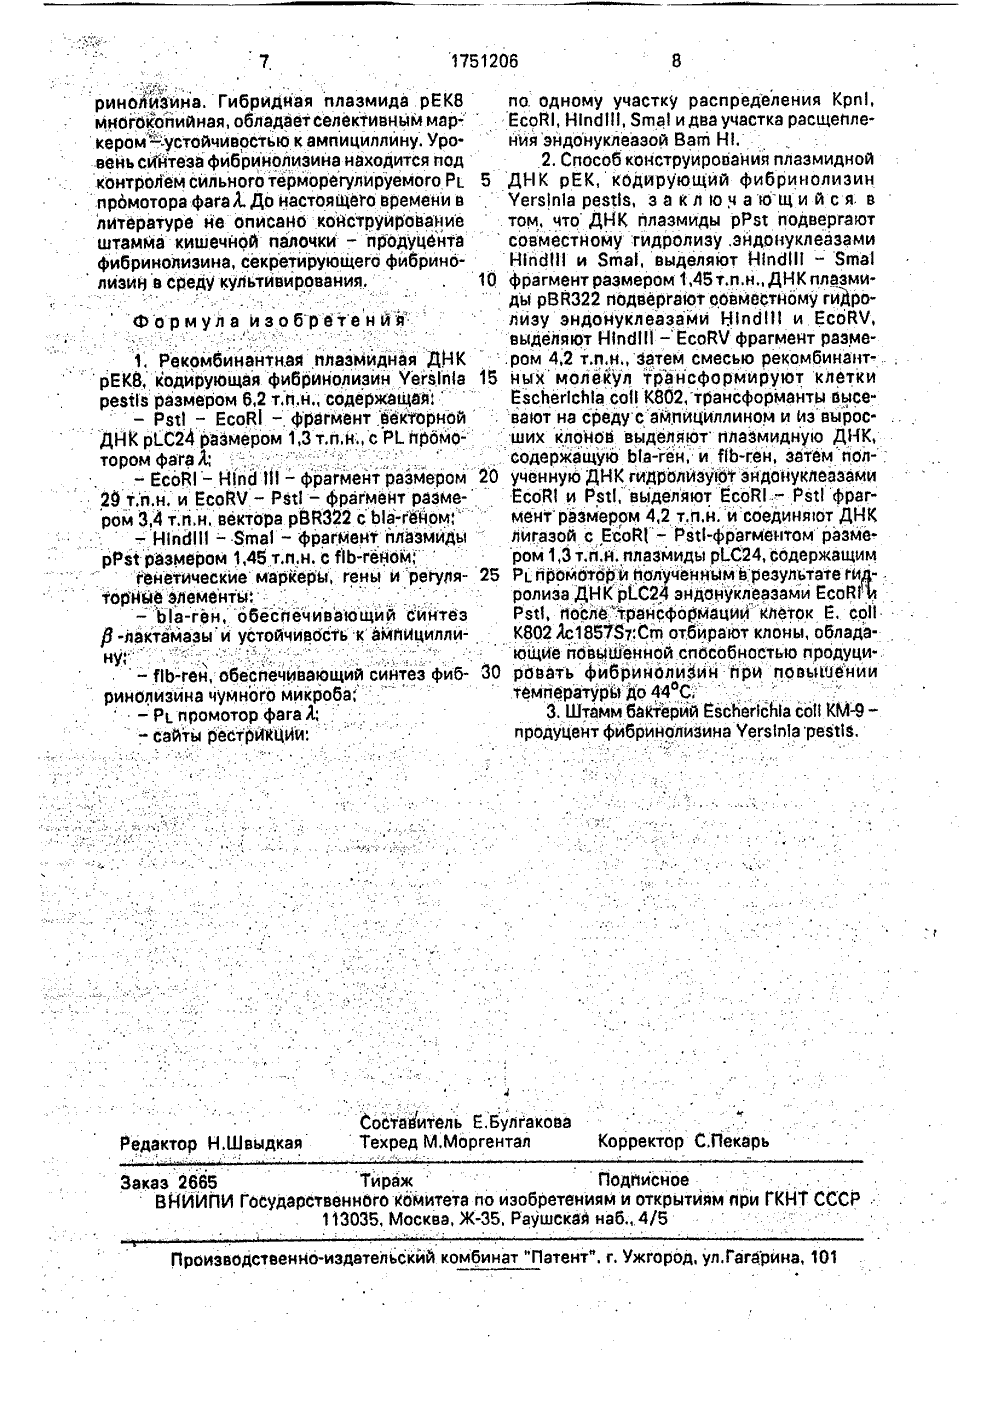 Плазмодитрофобласт